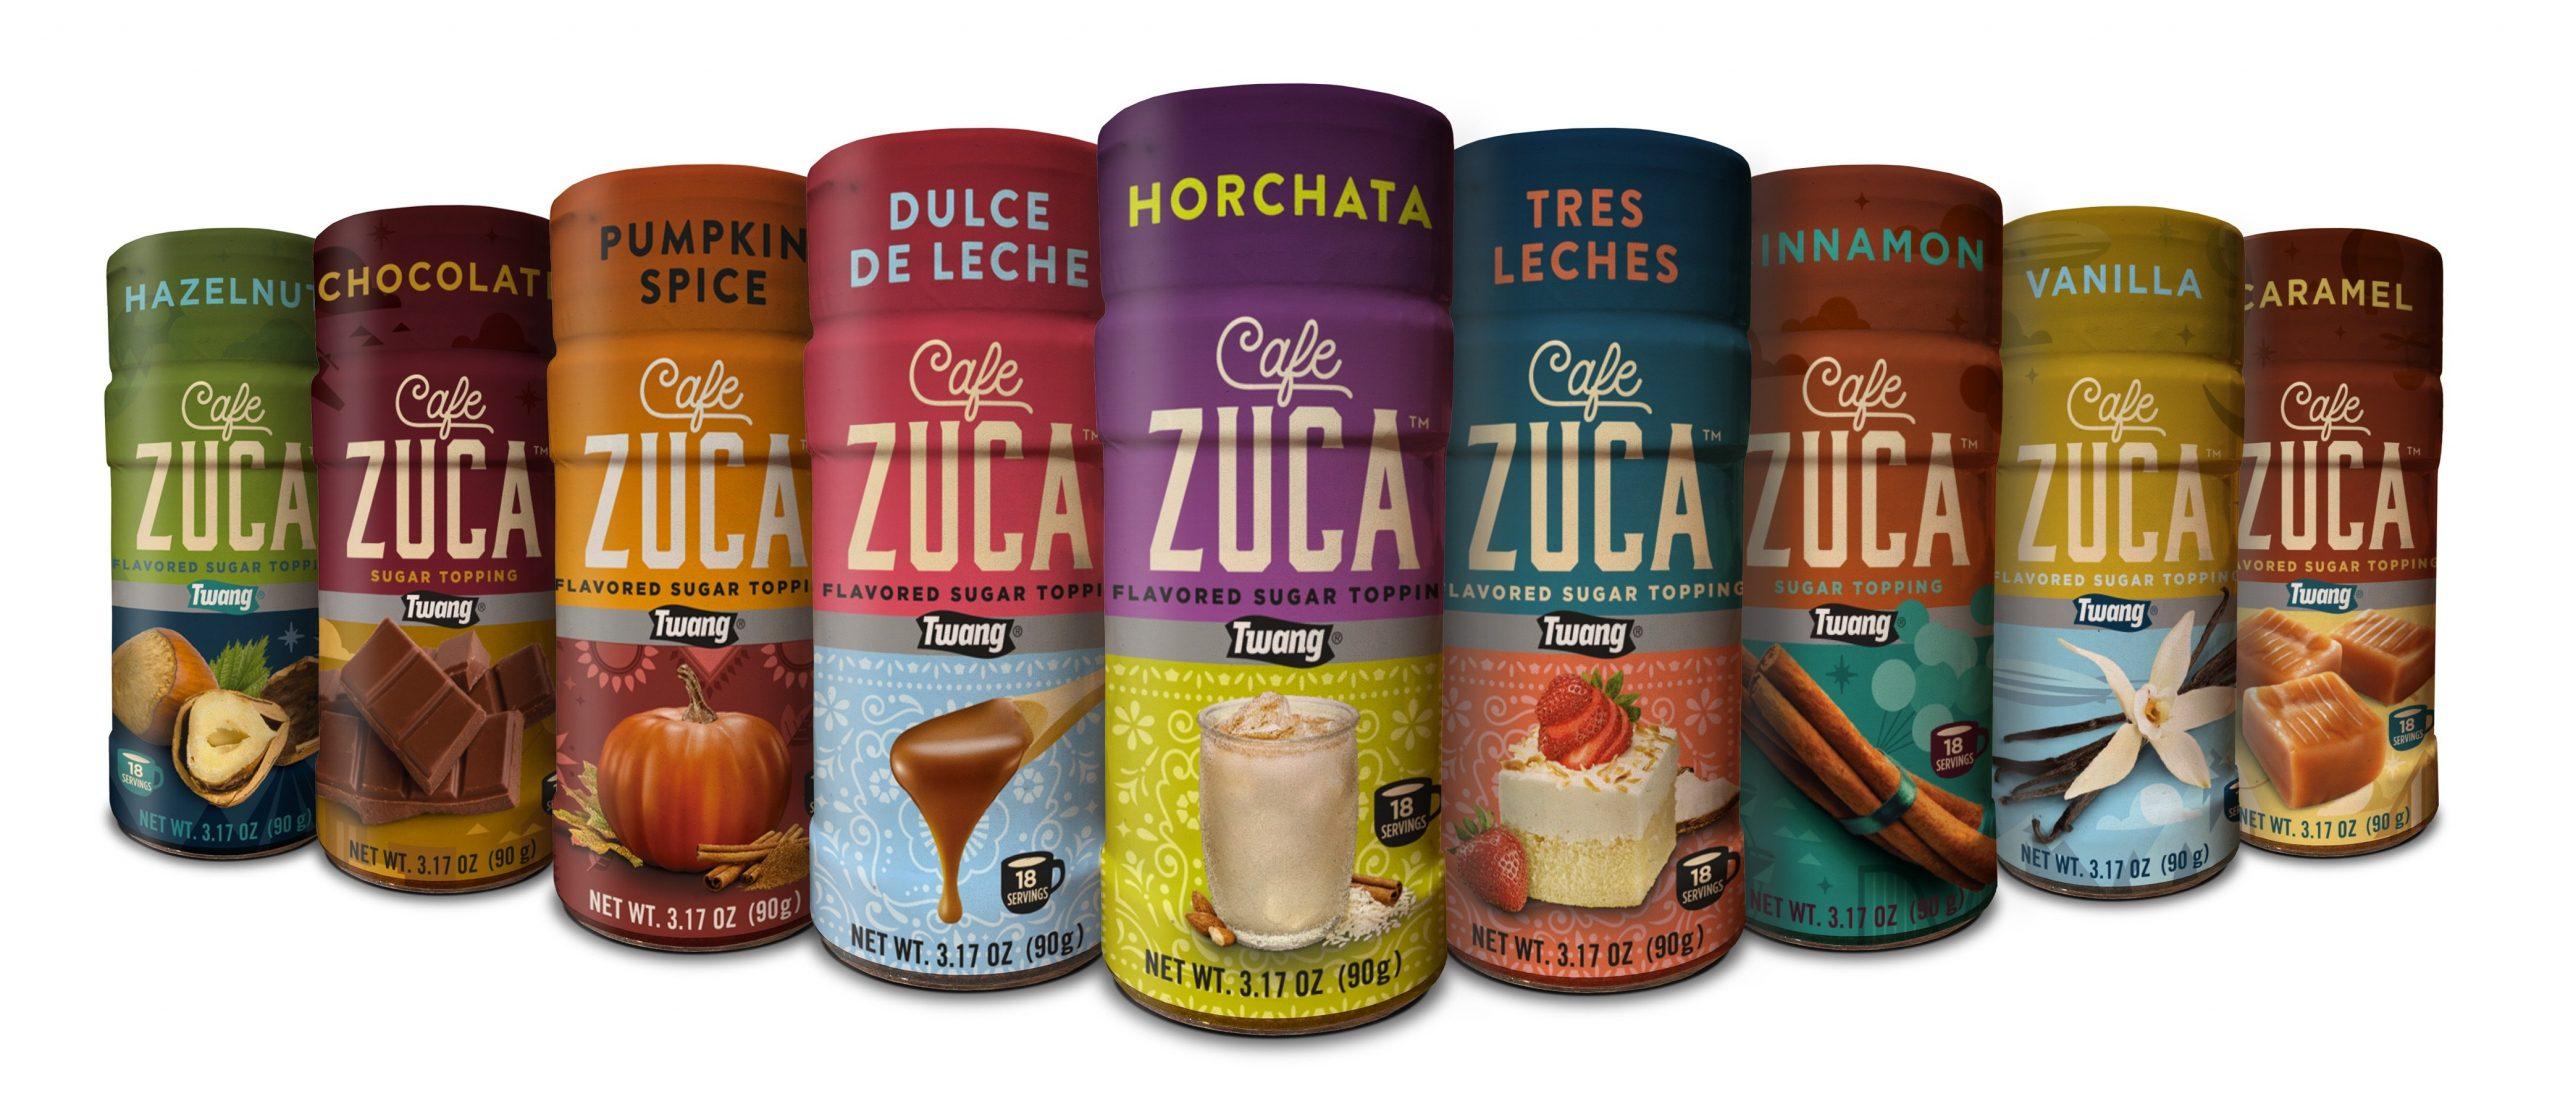 TWANG ANNOUNCES CAFÉ ZUCA'S AVAILABILITY AT H-E-B RETAILERS